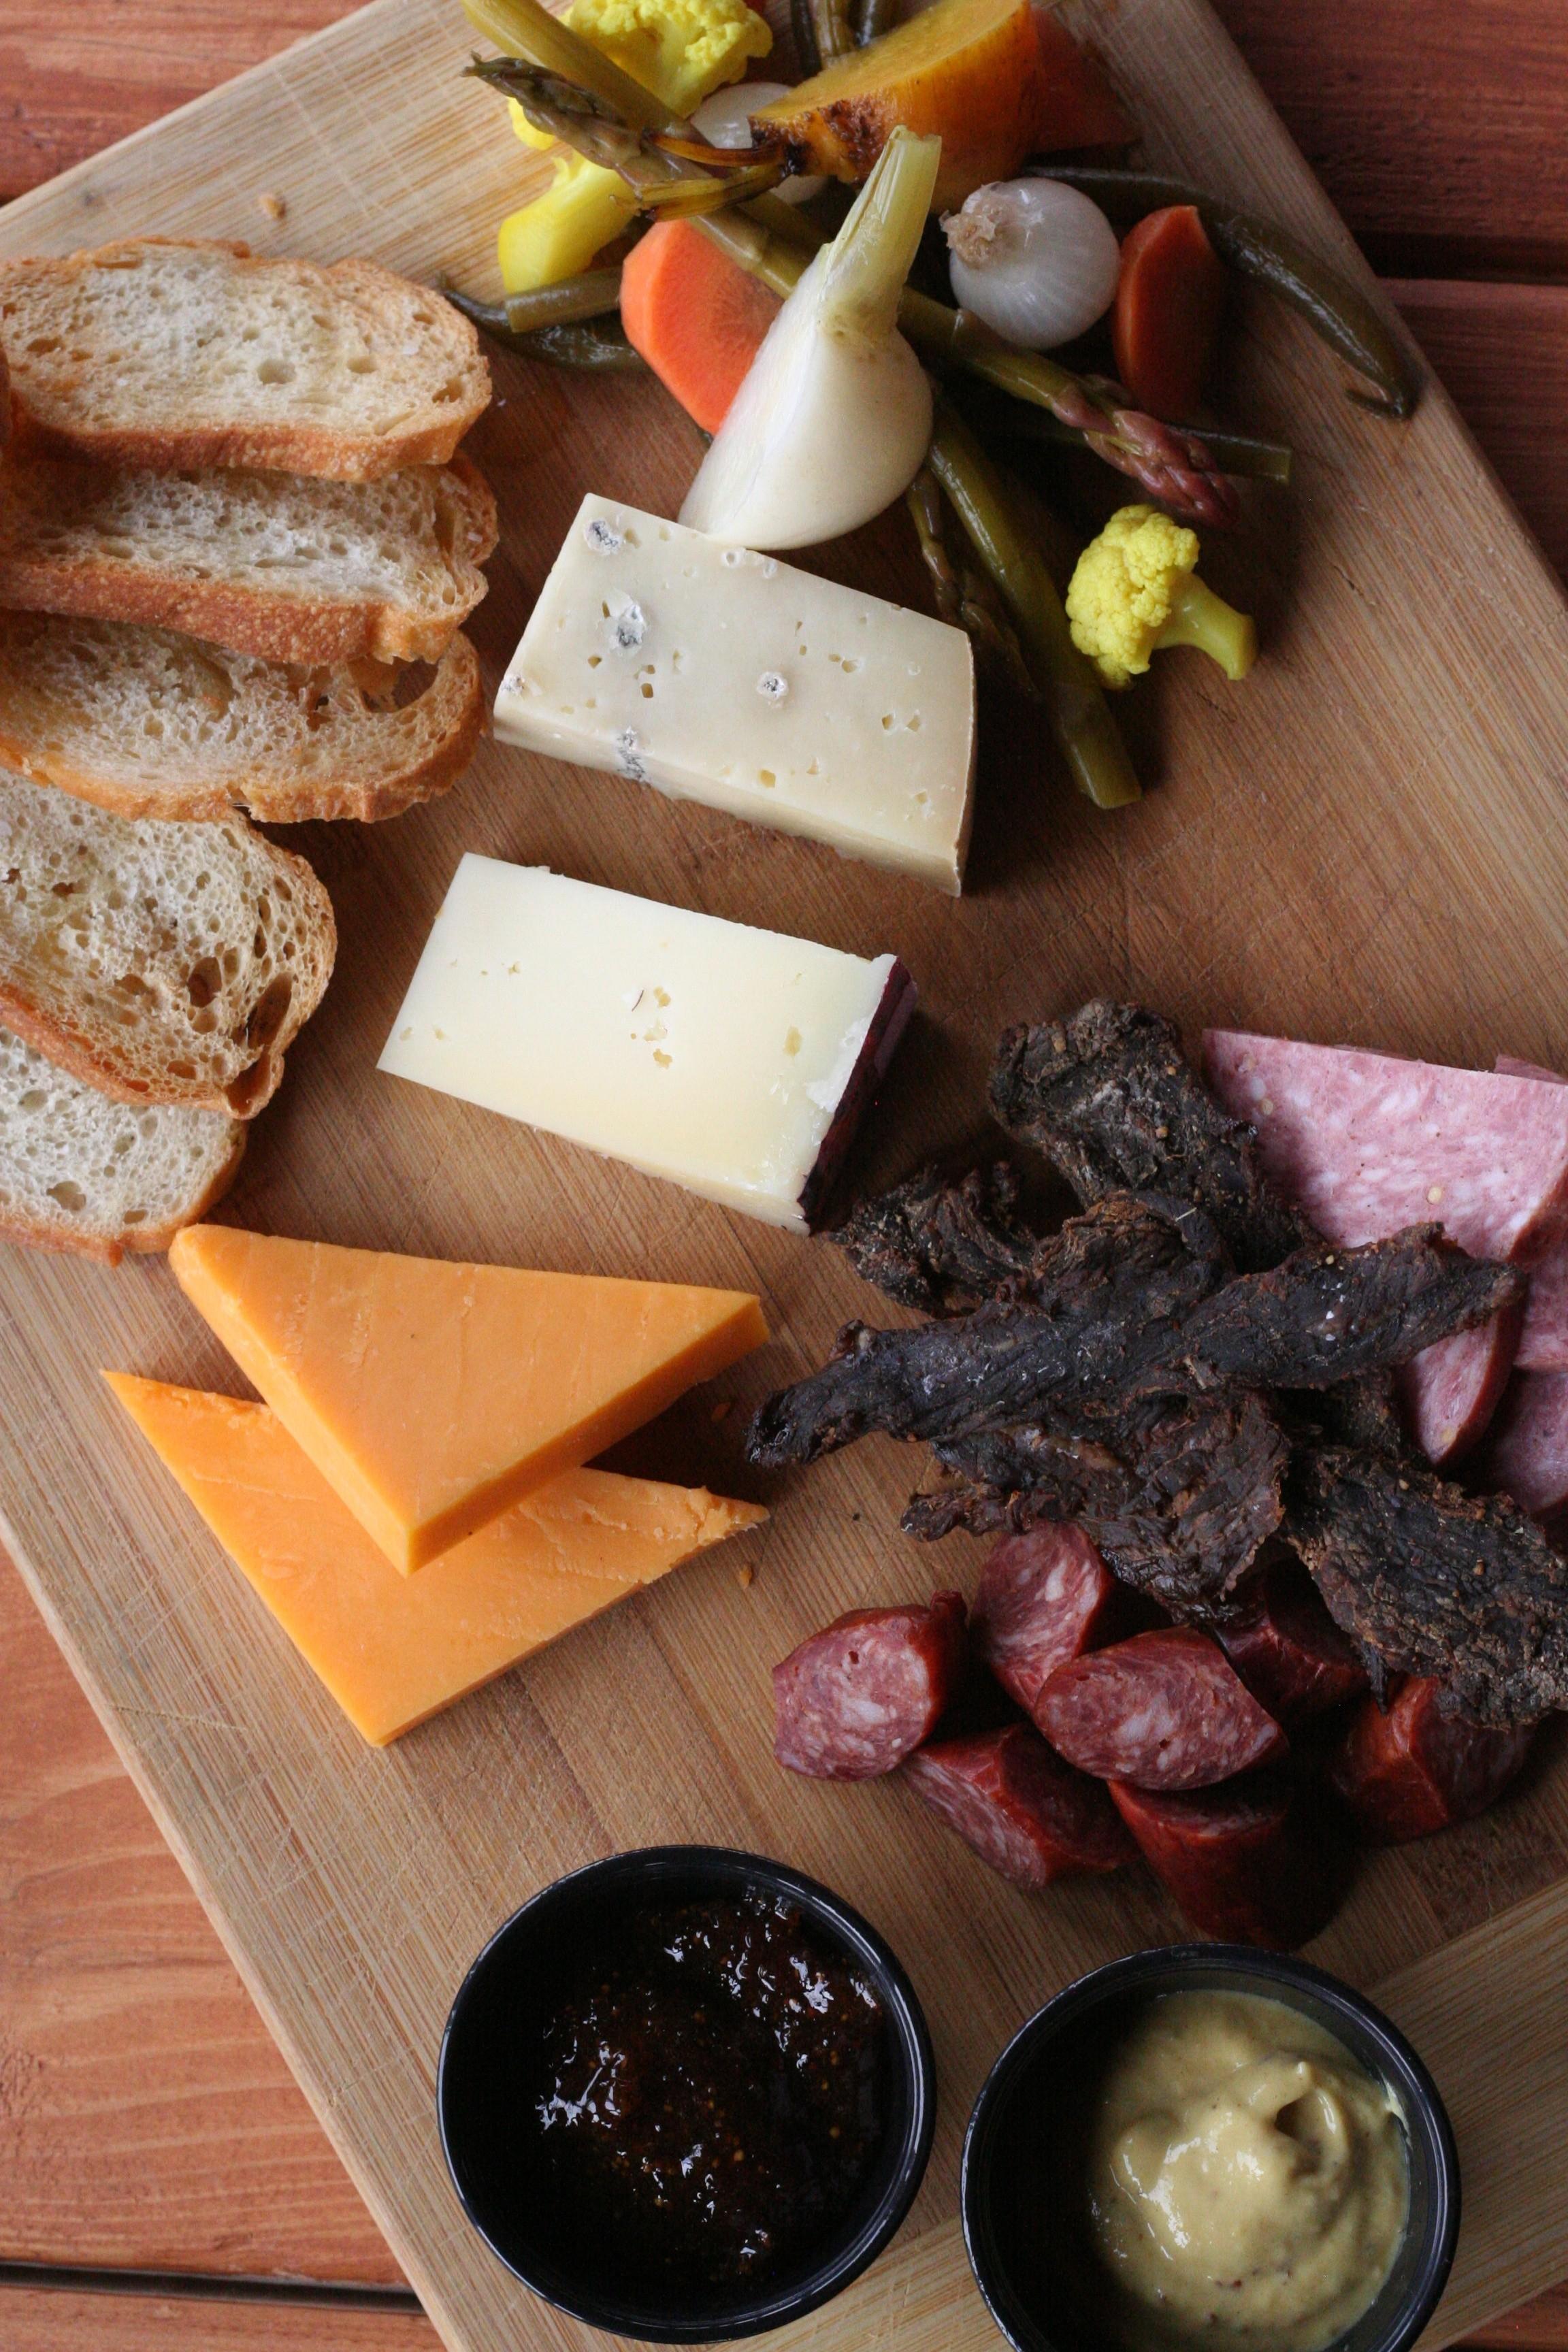 snax gastrobar brings a new neighborhood restaurant to lindenwood